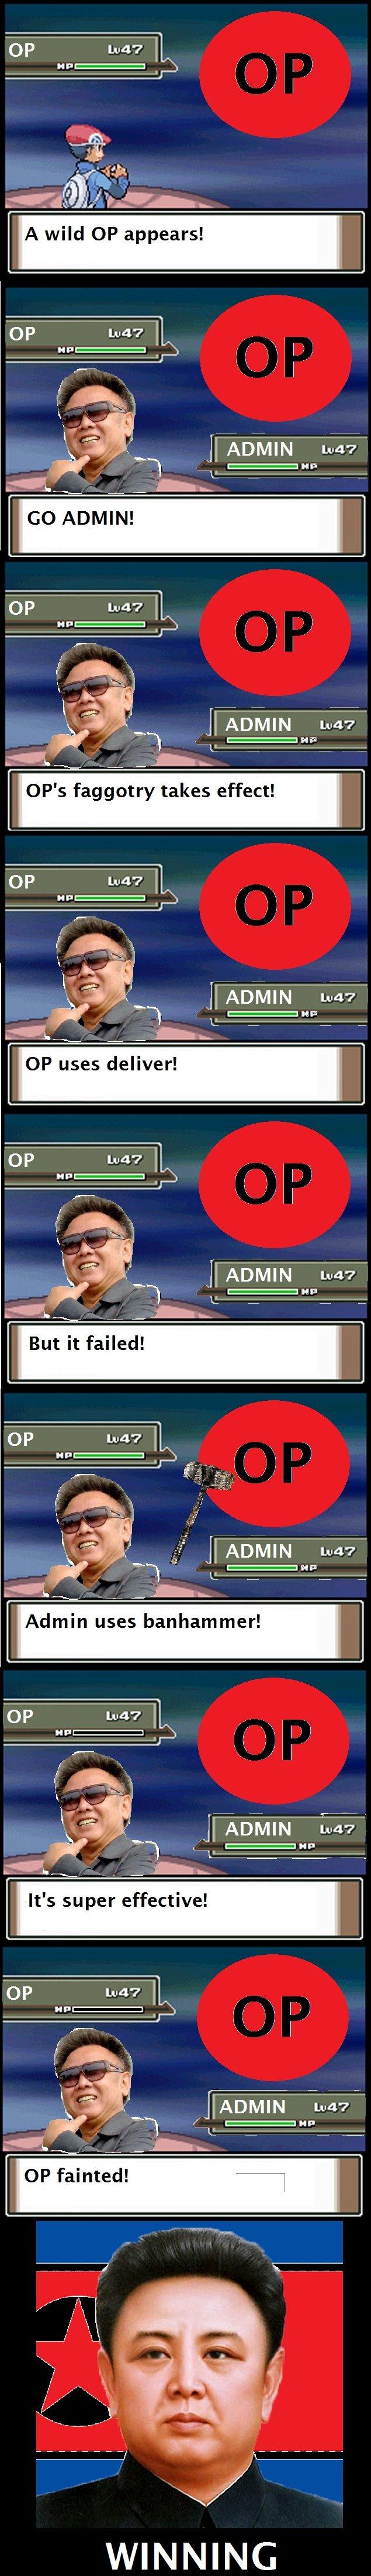 A WILD OP APPEARS!. oc by me. op l A wild OP appears! I GO ADMIN! I or cavill N, w', l ?iall! WINNING. that made my humor gland hurt...utter :( OP admin Pokemon